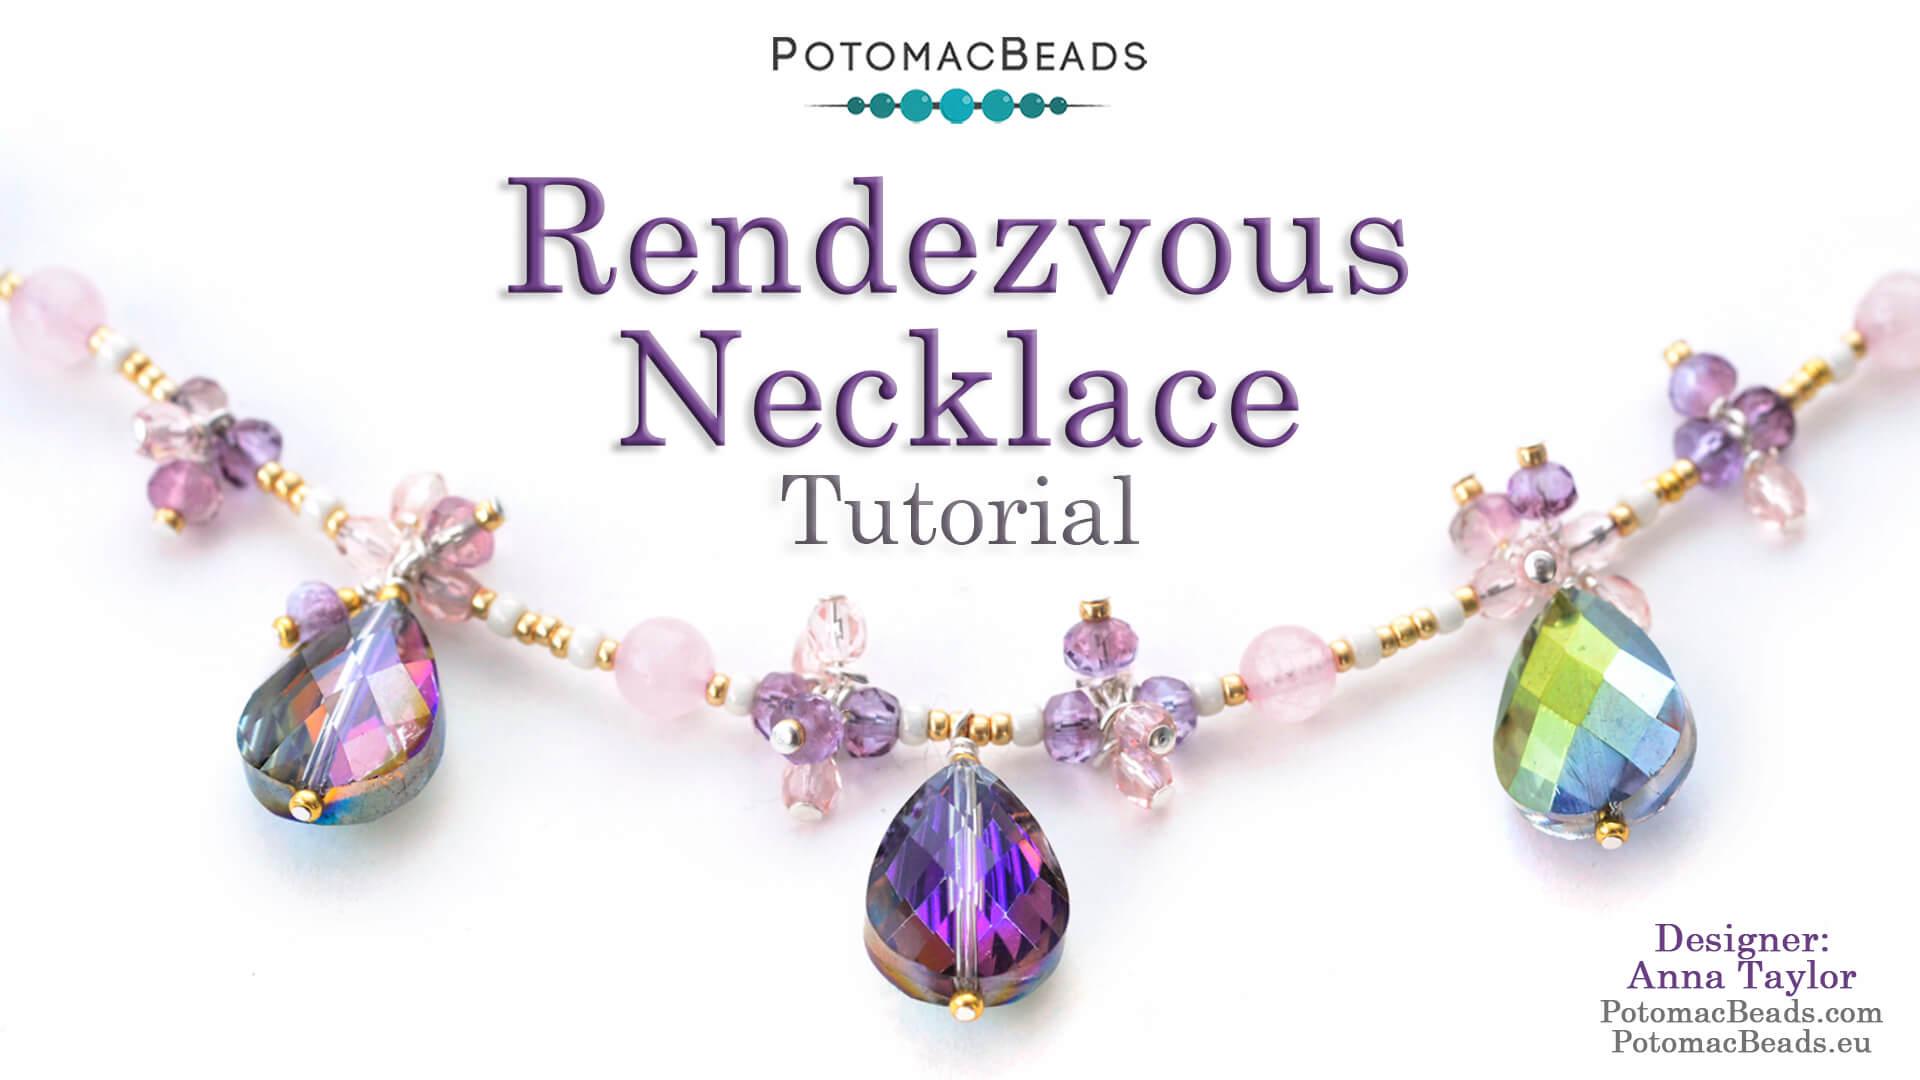 How to Bead Jewelry / Beading Tutorials & Jewel Making Videos / Bead Weaving Tutorials & Necklace Tutorial / Rendezvous Necklace Tutorial